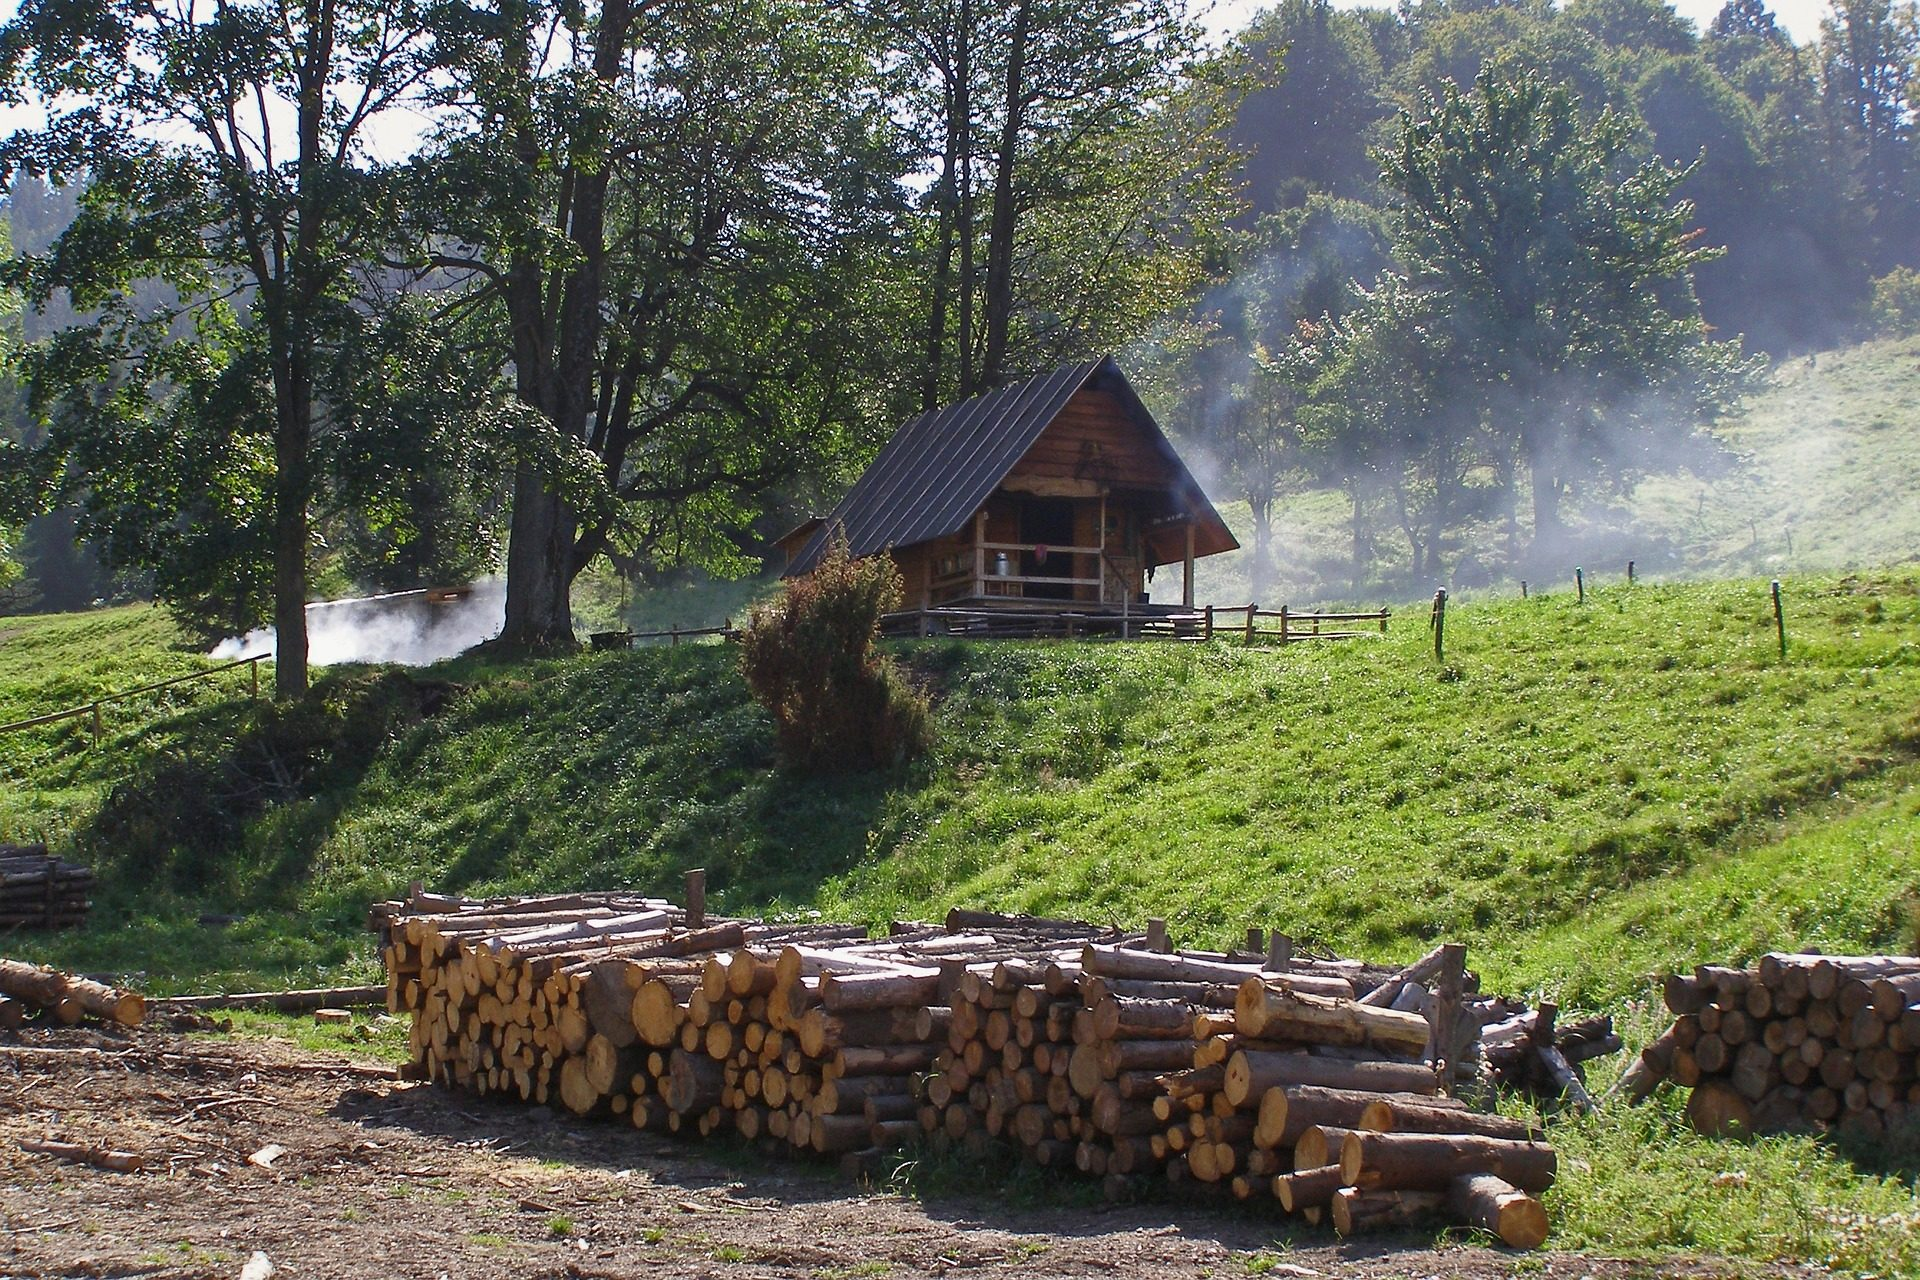 Fondo de pantalla de caba a bosque rboles troncos - Cabanas de madera en arboles ...